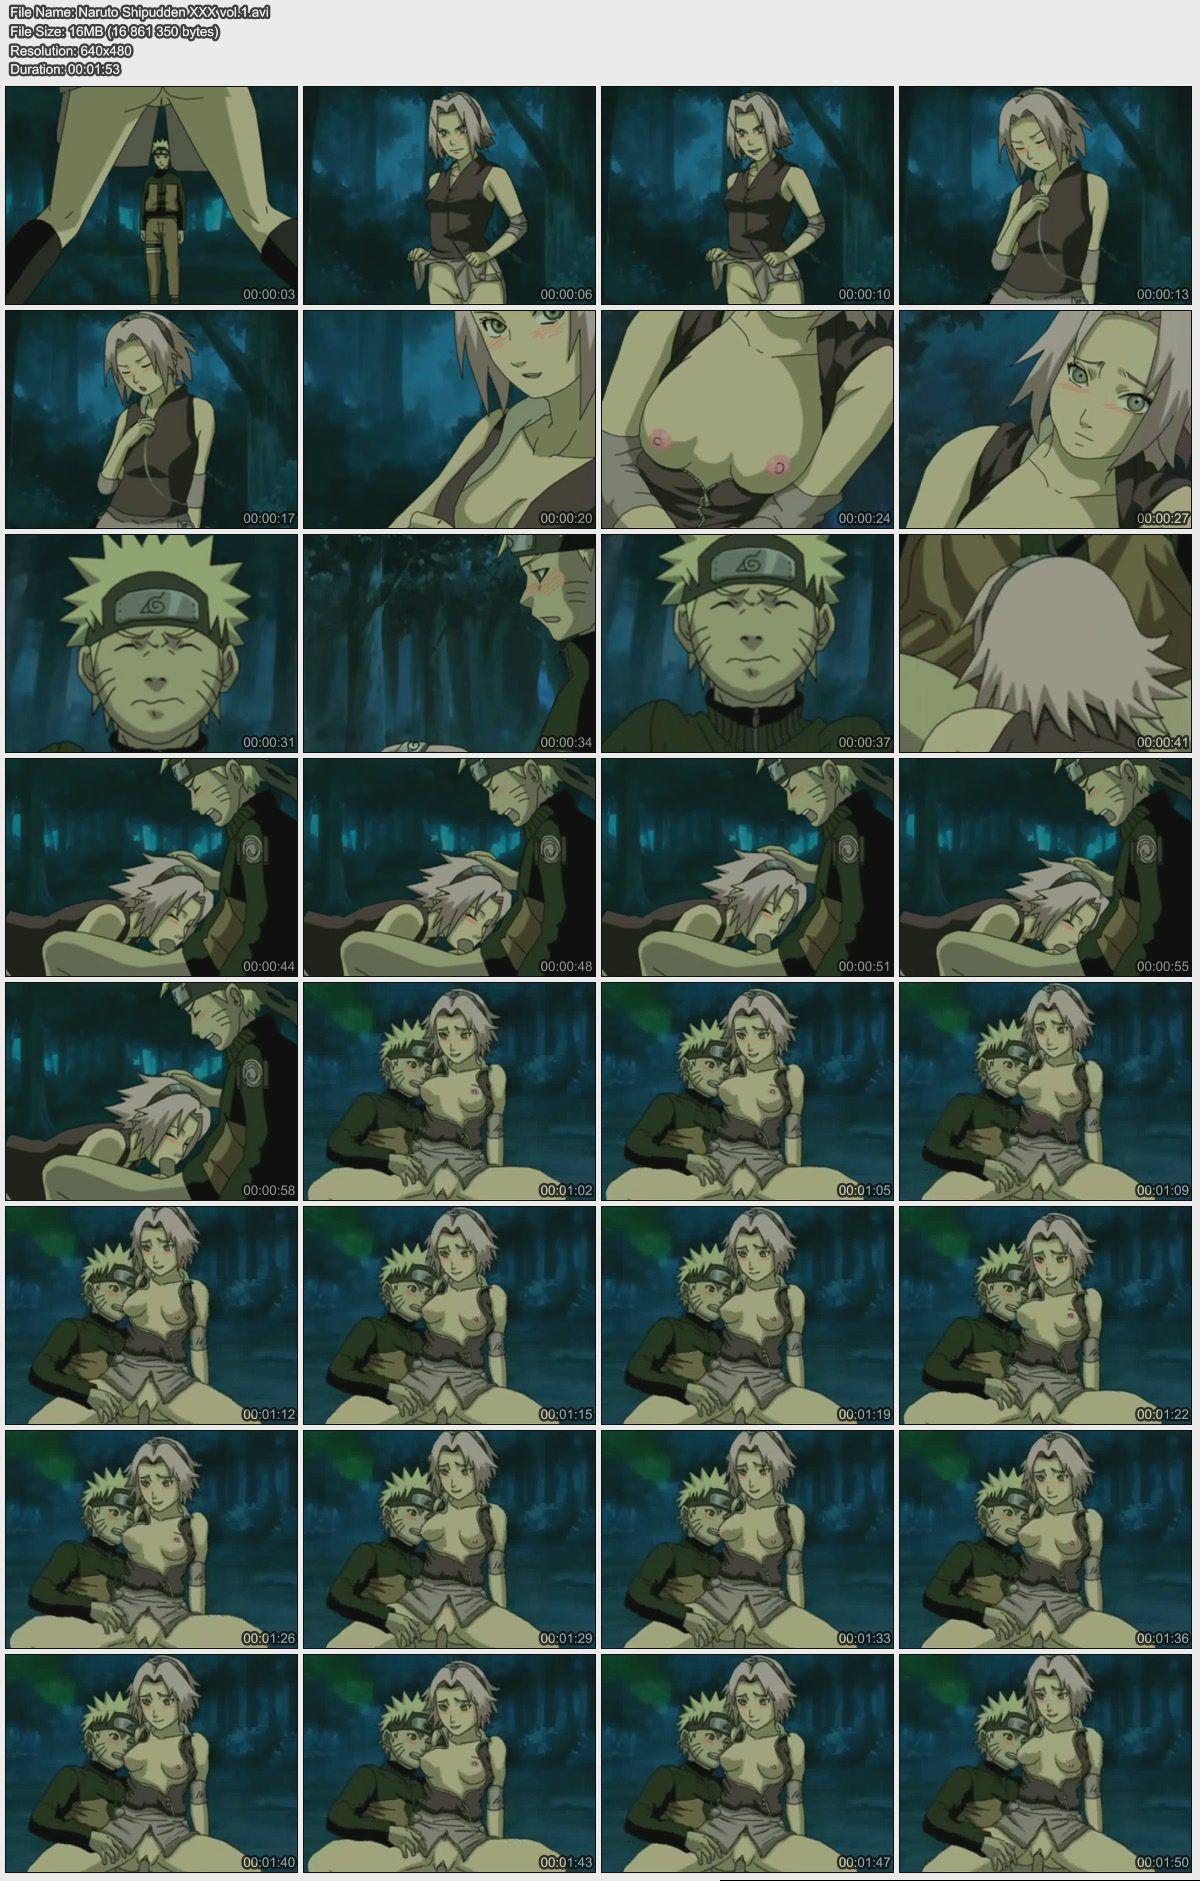 Naruto Hentai video / Видео хентай Наруто [Ep.1-9] [ENG,JAP] Anime Hentai